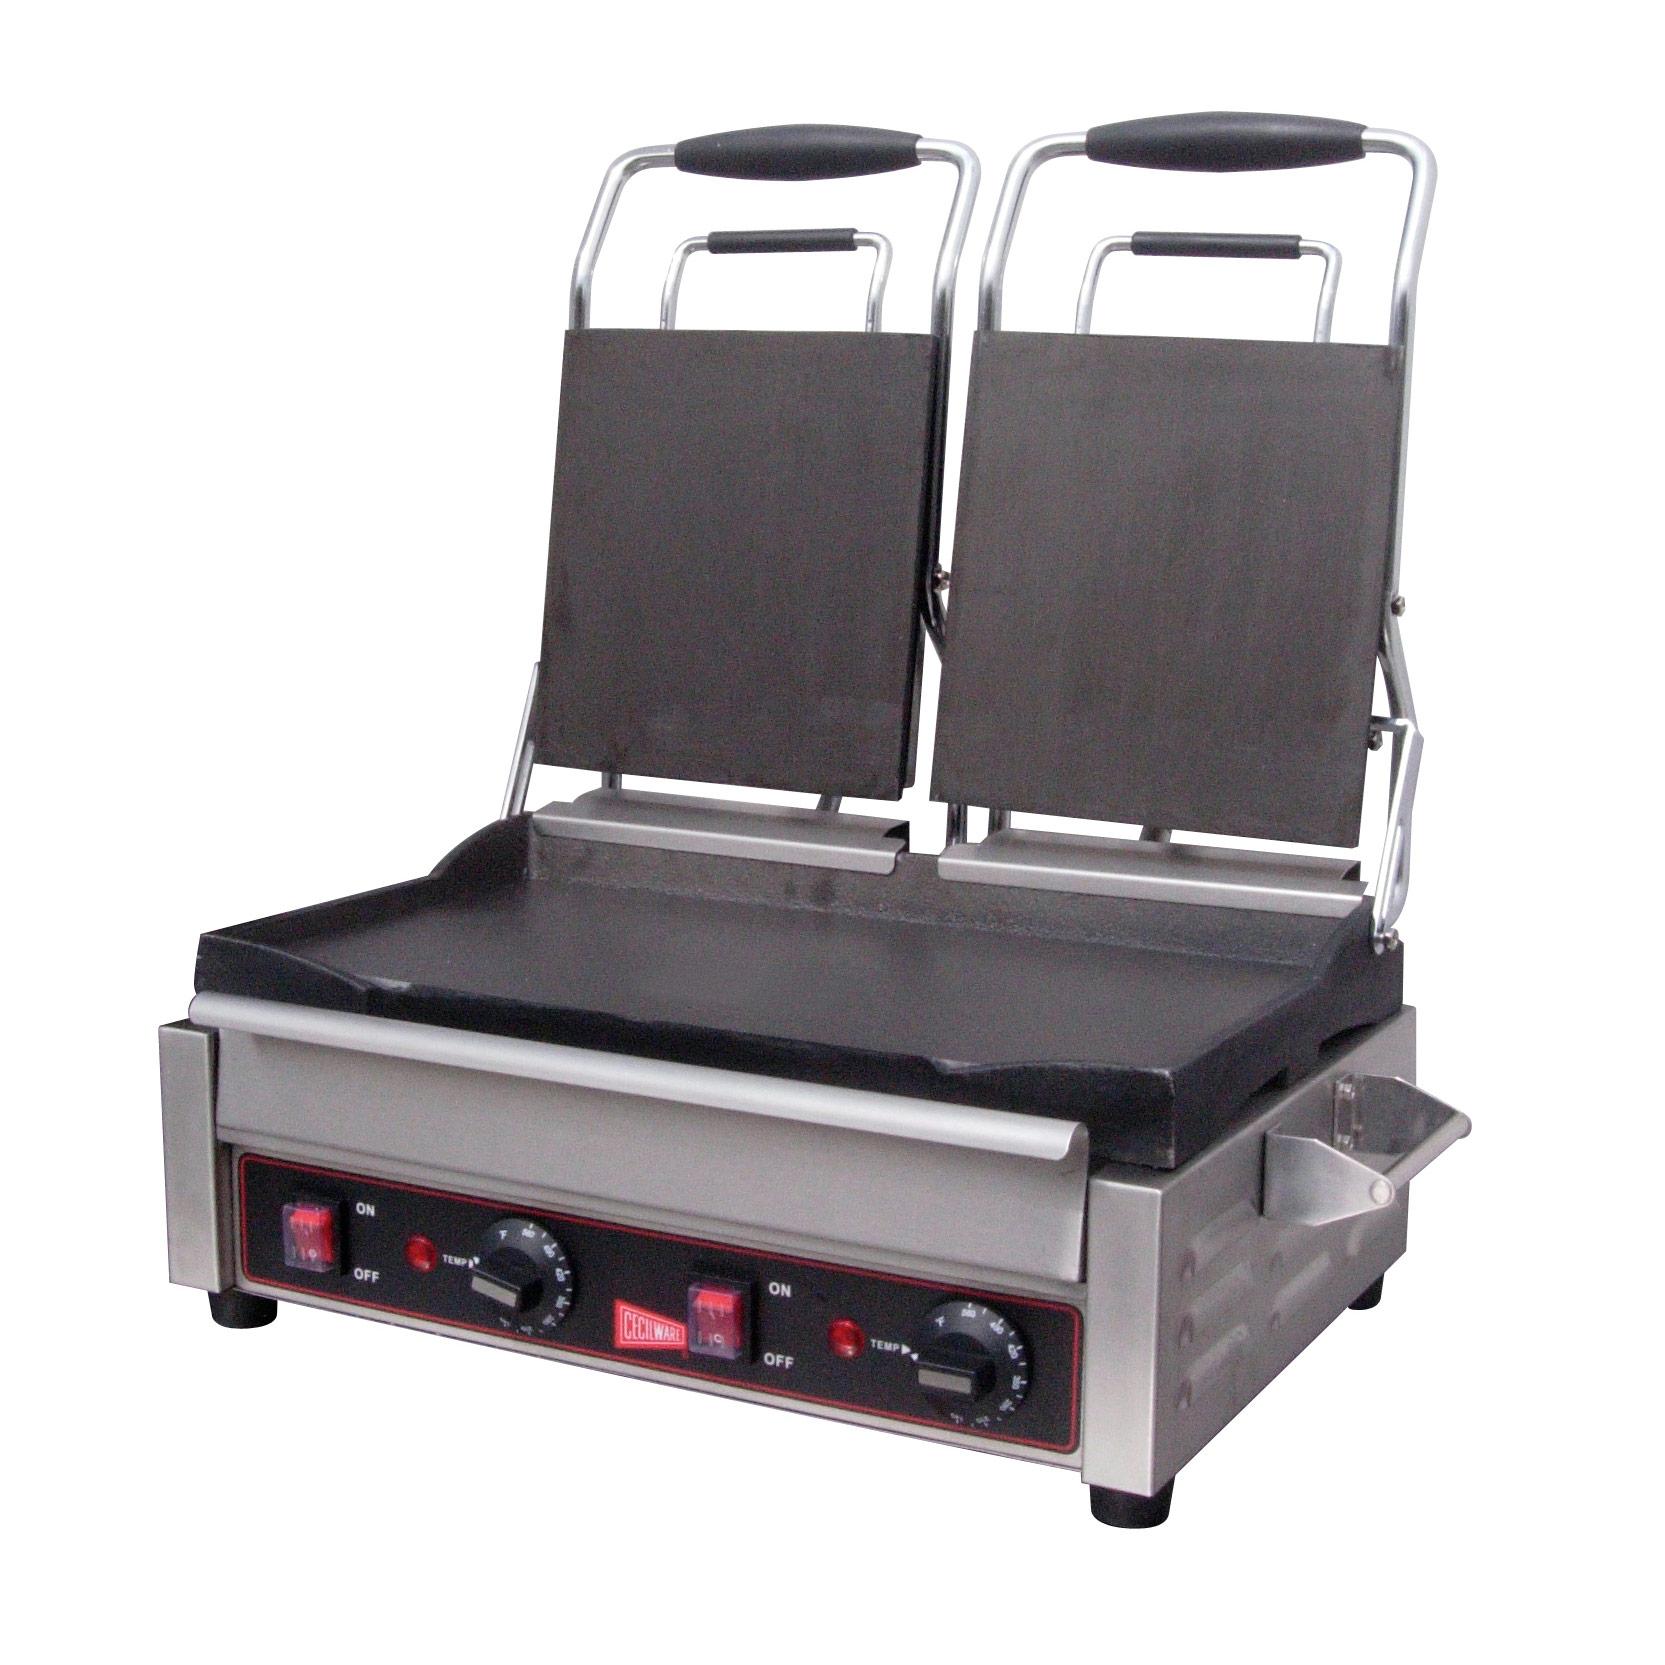 Grindmaster-Cecilware SG2LF sandwich / panini grill